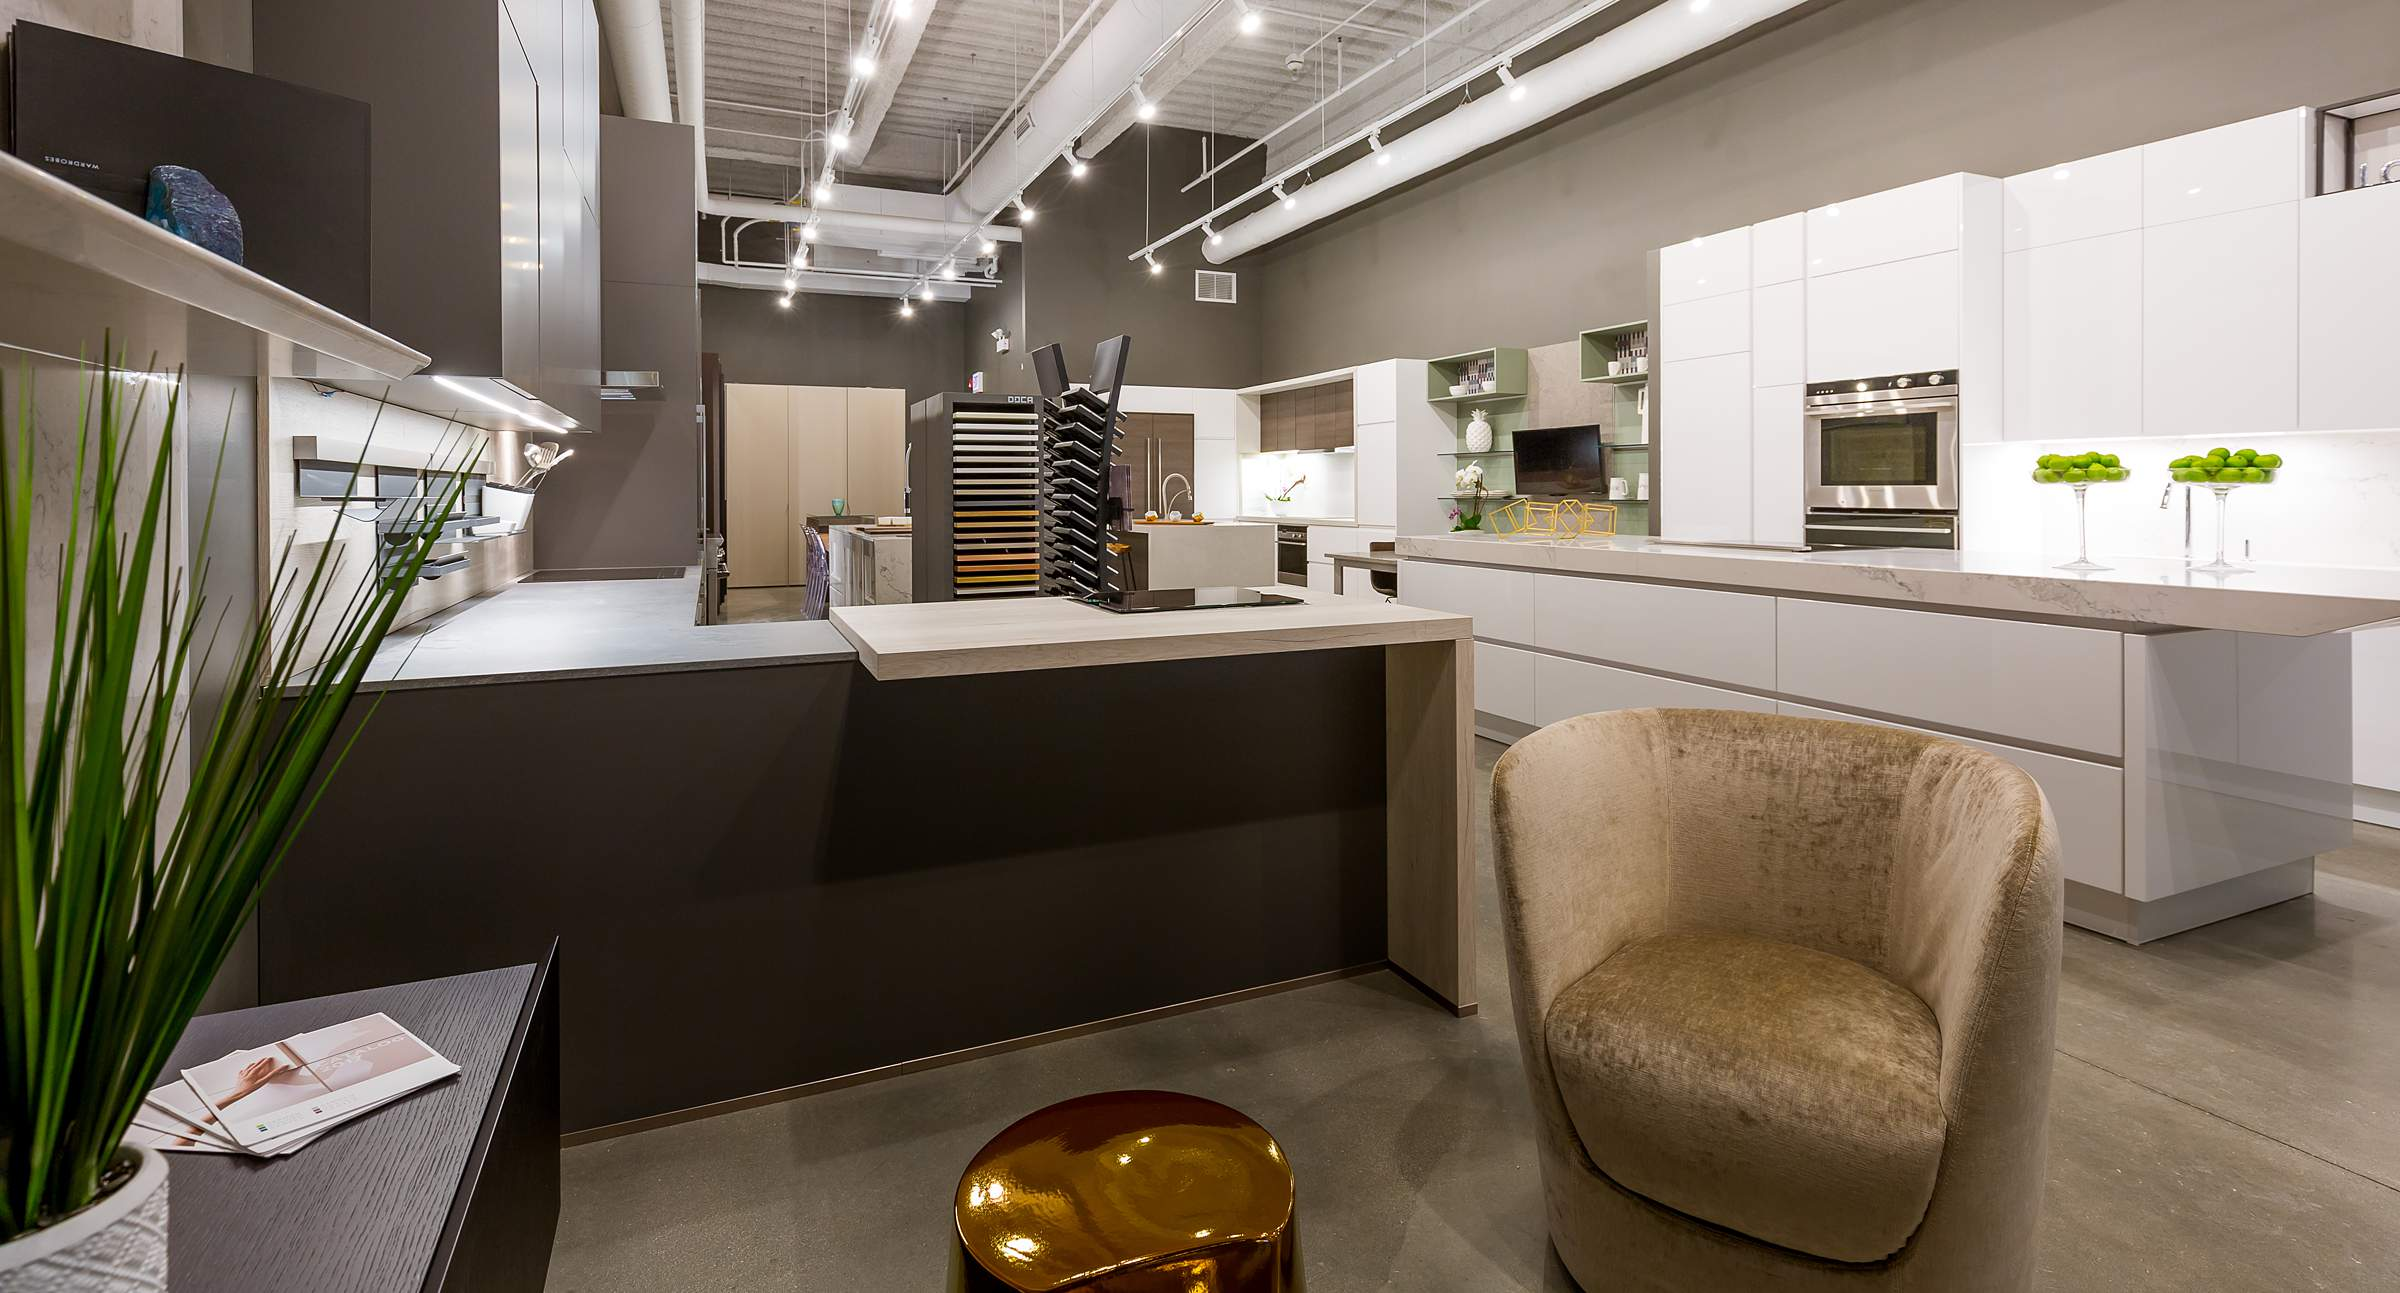 Kitchen Design Showroom Virtual Tour Chicago 360 IMG_0583